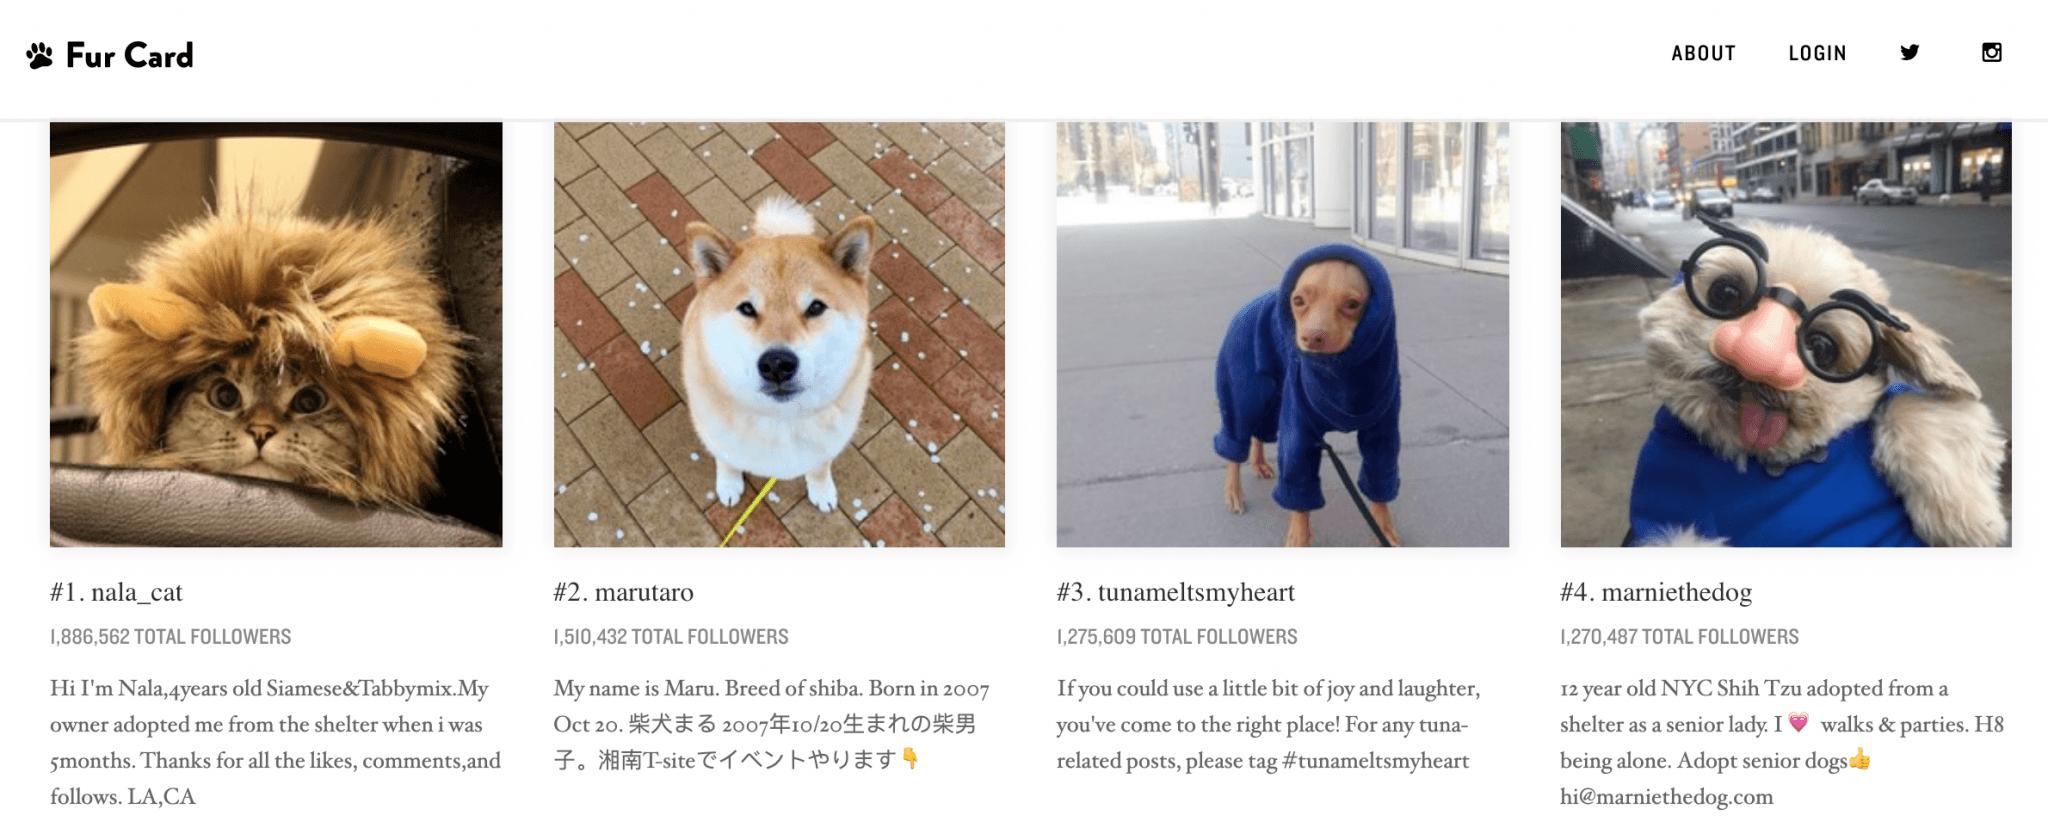 fur card animal influencers image